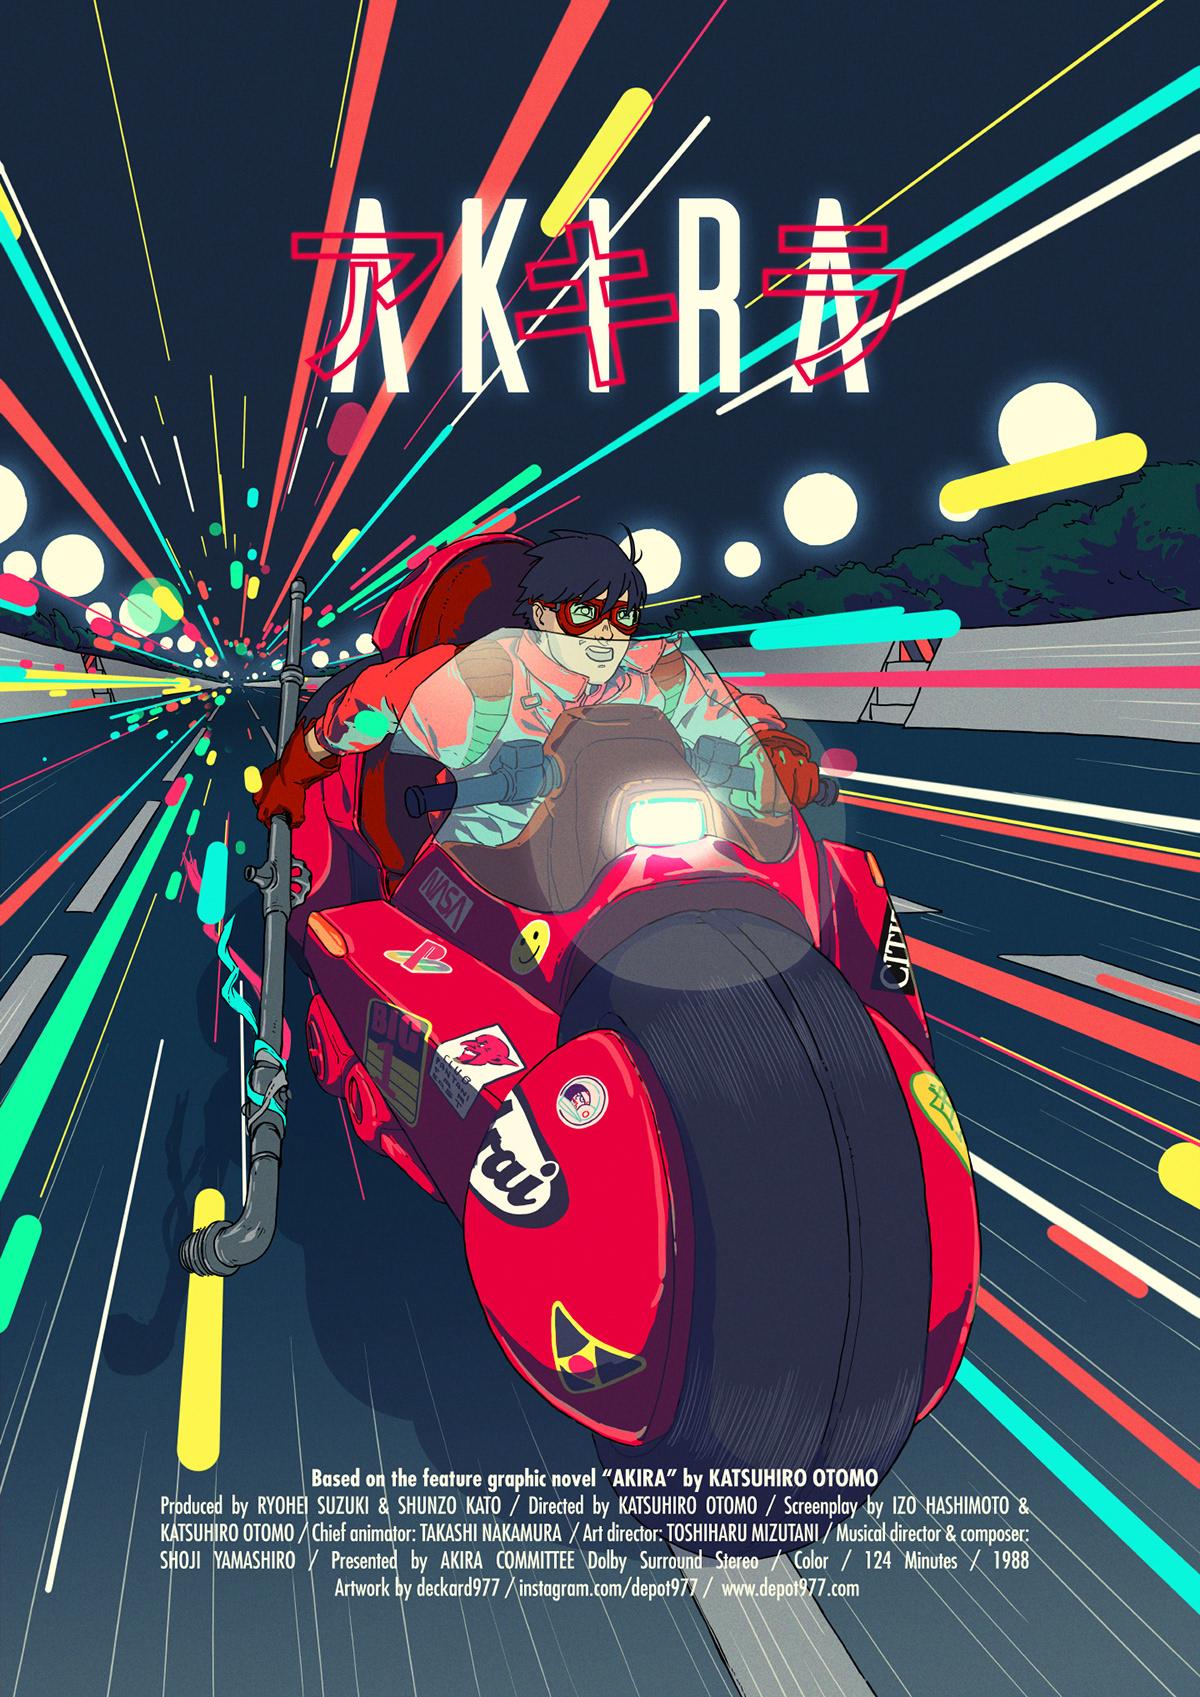 akira,animation ,anime,AR,fanart,ILLUSTRATION ,Kinetic Poster,motion,motion design,poster